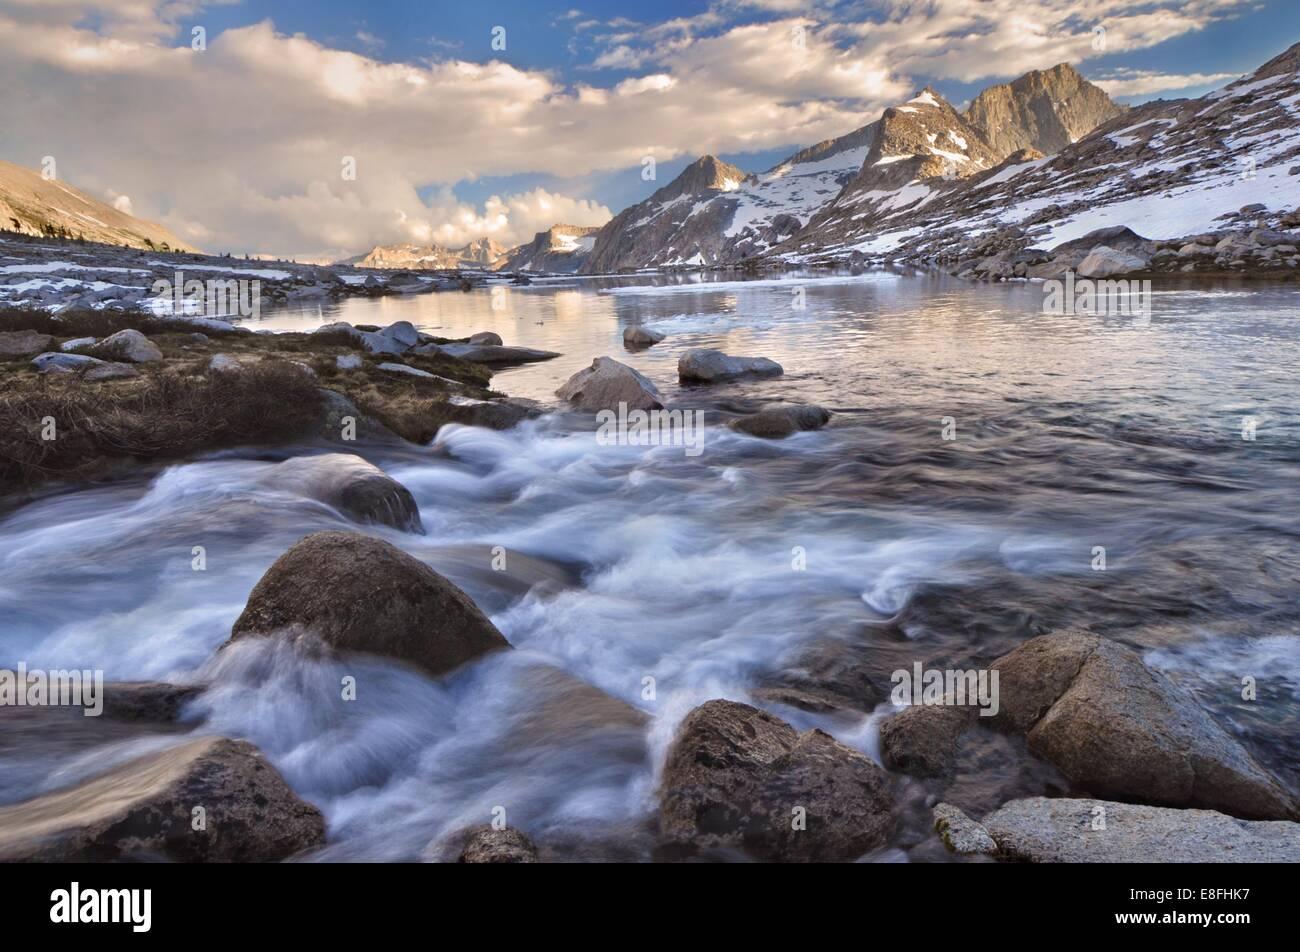 USA, California, Sequoia National Park, Nine Lake drainage and Eagle Scout Peak - Stock Image